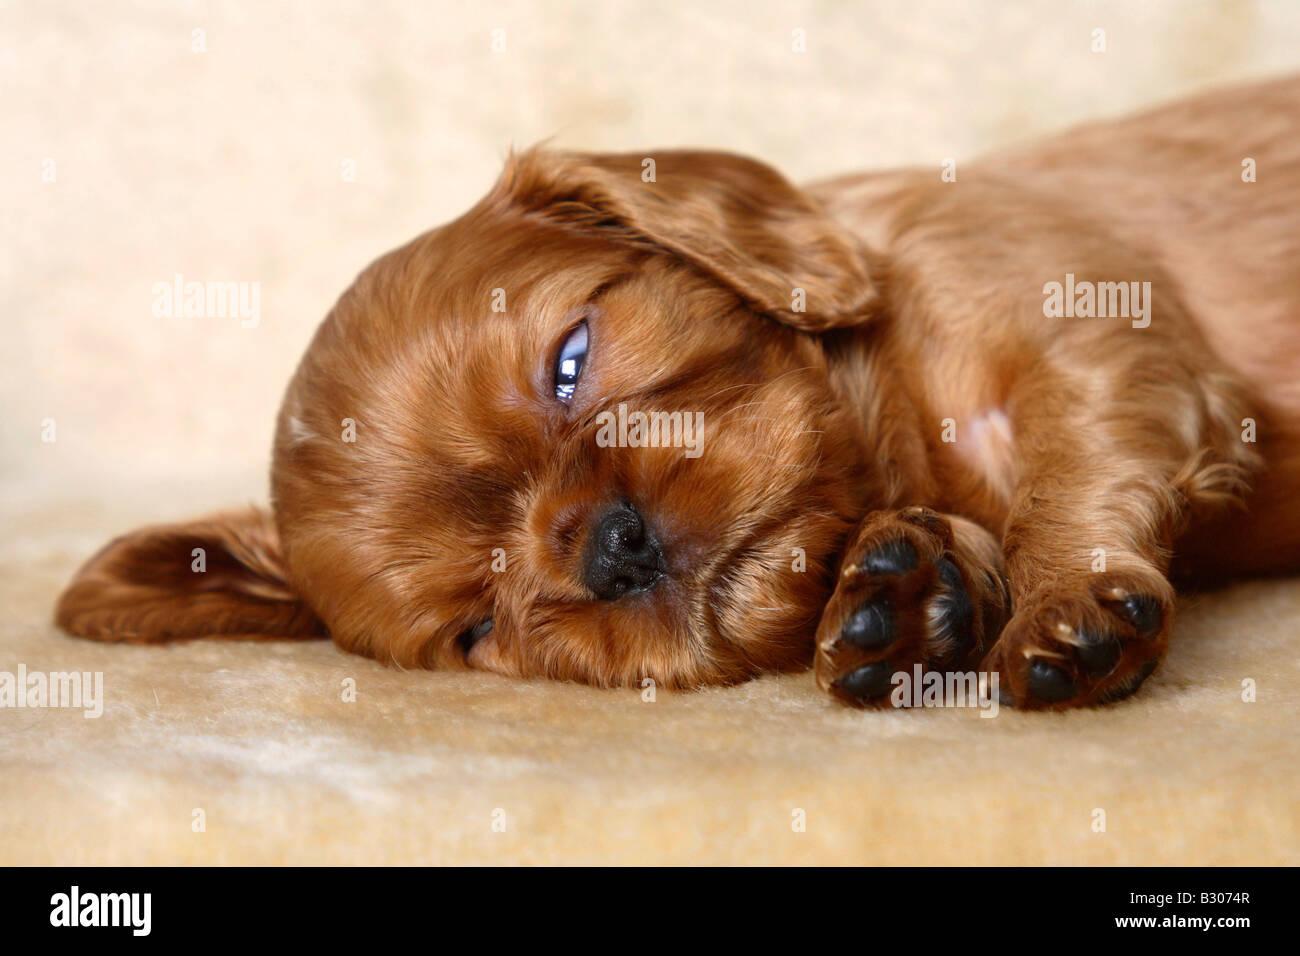 Cavalier King Charles Spaniel puppy ruby 5 weeks REM sleep - Stock Image